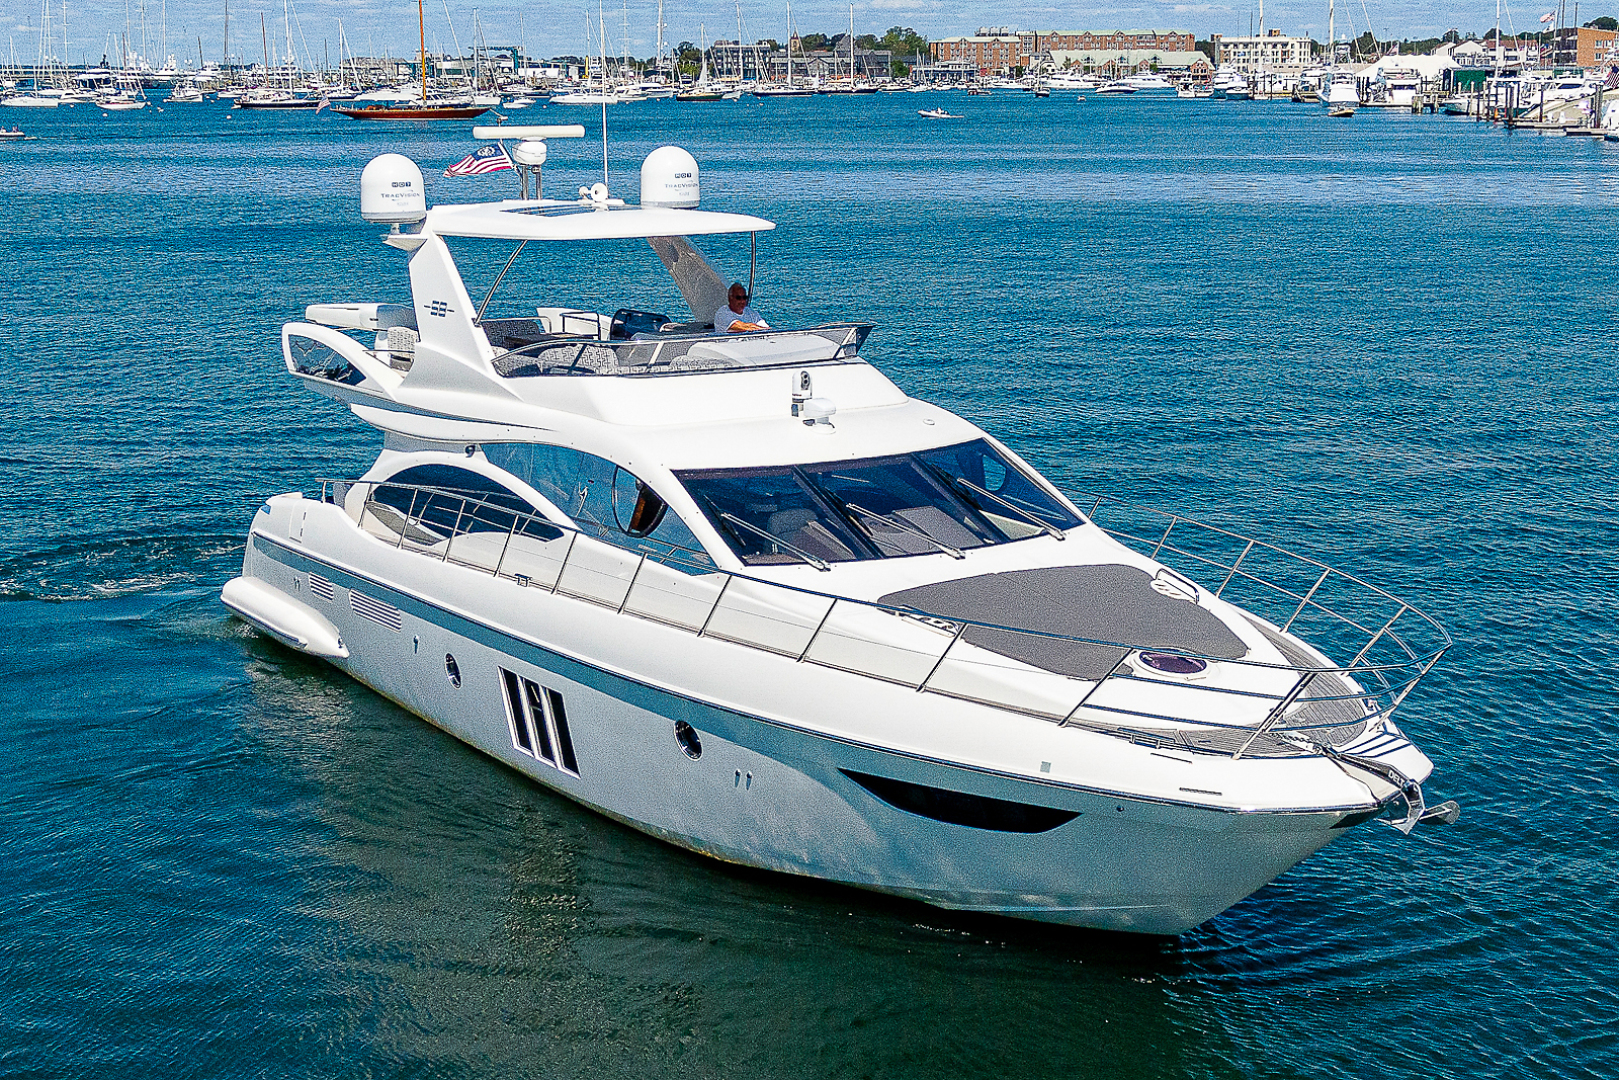 Azimut-58 Fly Motor Yacht 2011-Nova Fort Lauderdale-Florida-United States-58_azimut_nova__aerials16-1490482 | Thumbnail